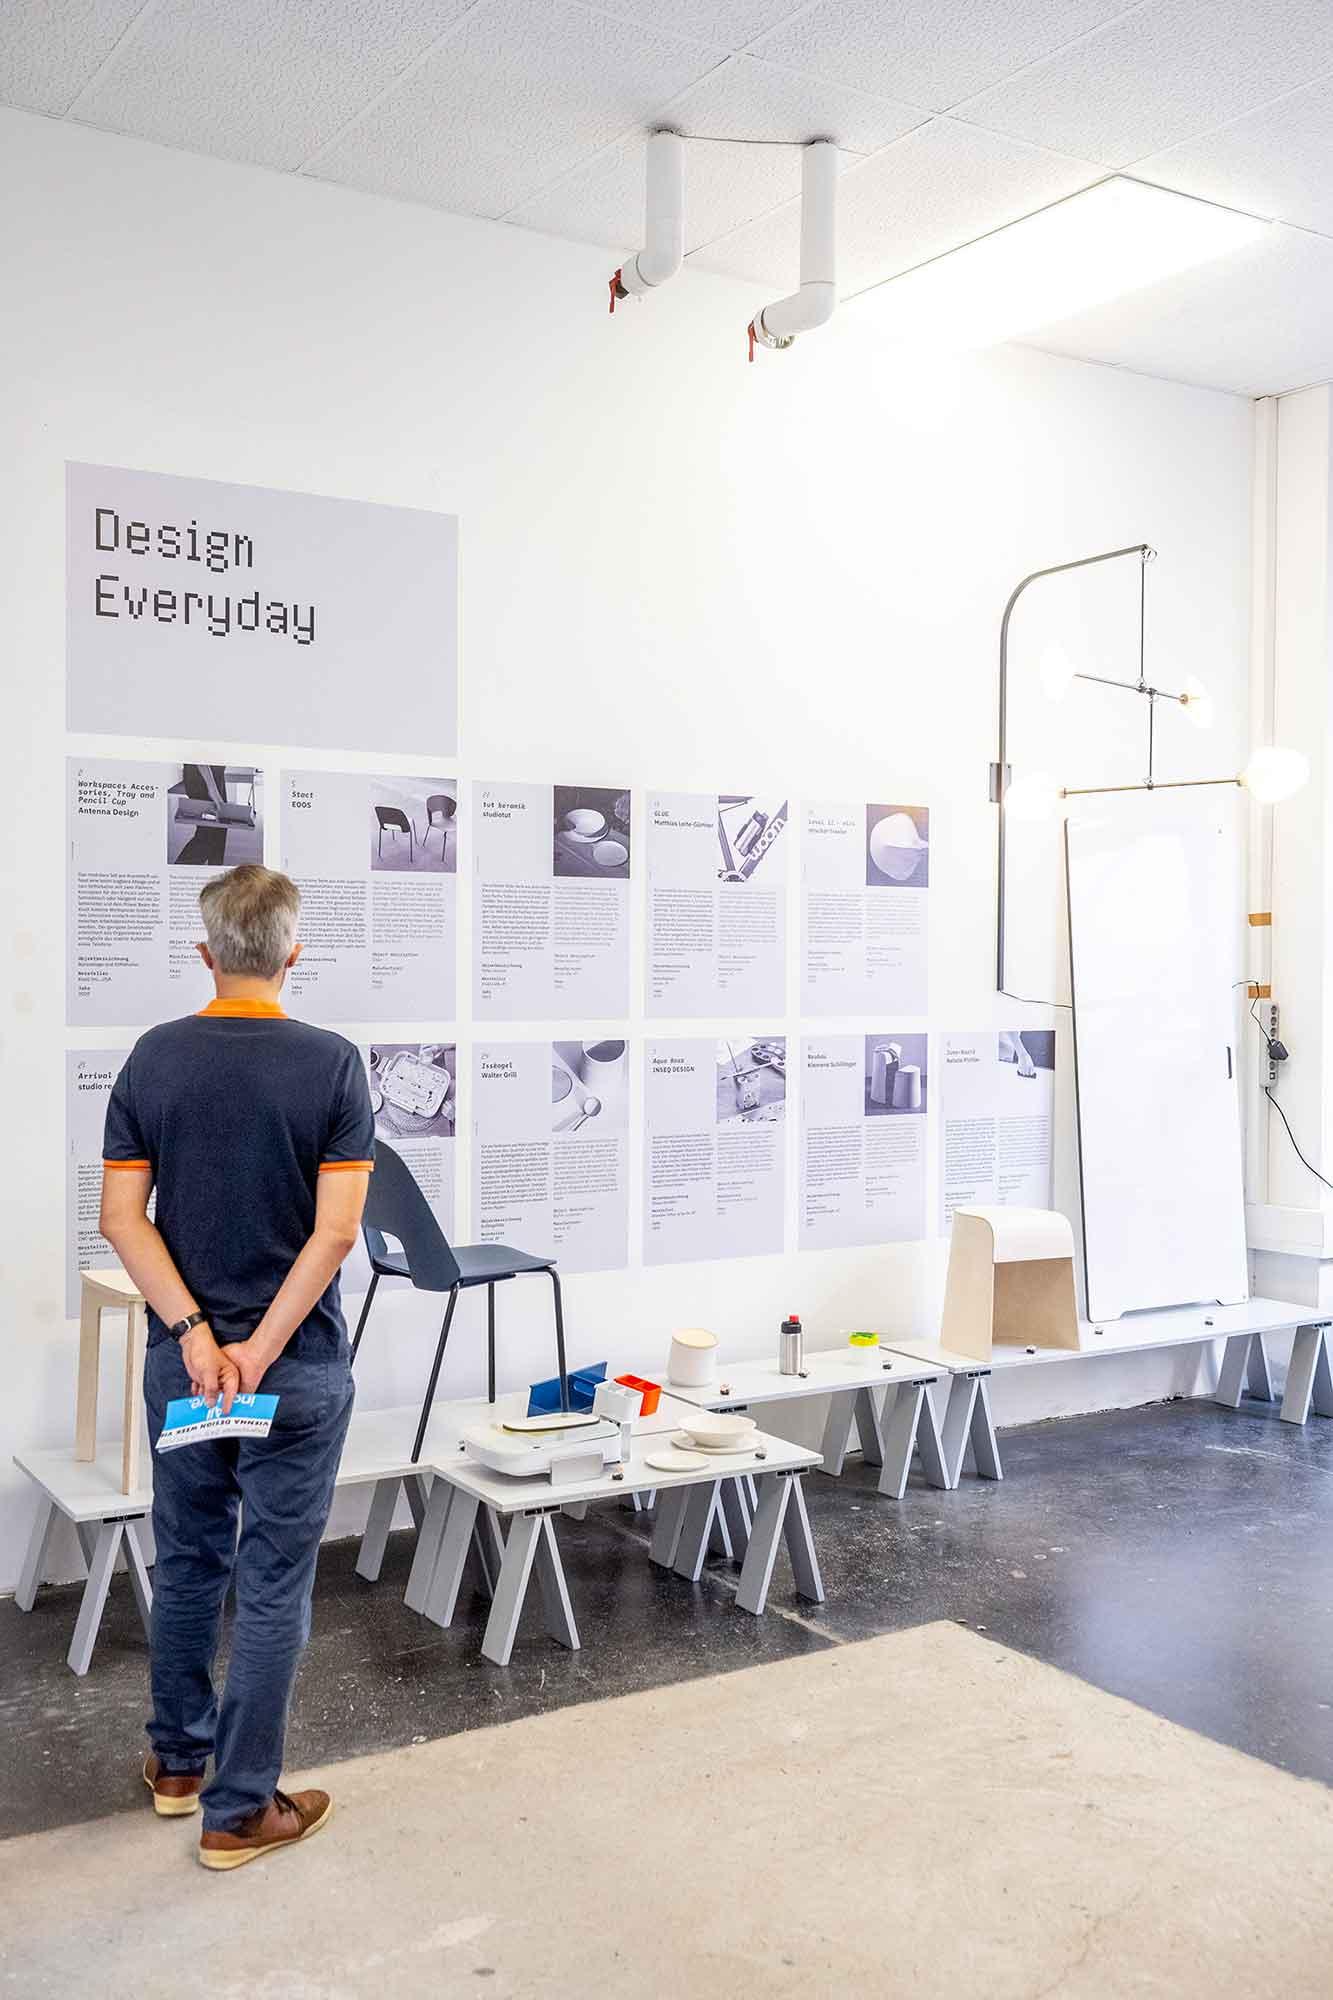 Design Everyday, VDW21